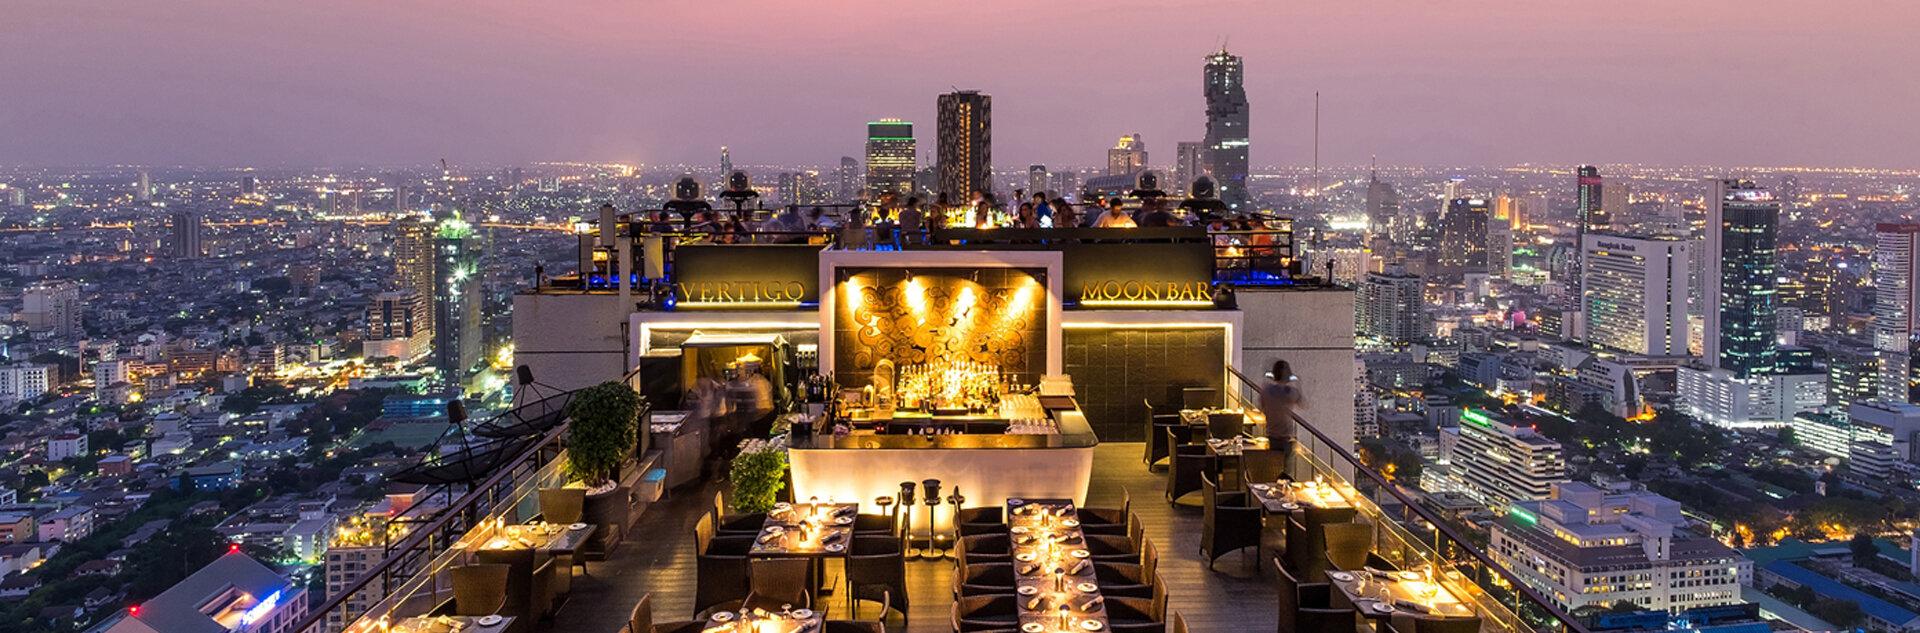 Restaurant rooftop vertigo banyan tree bangkok